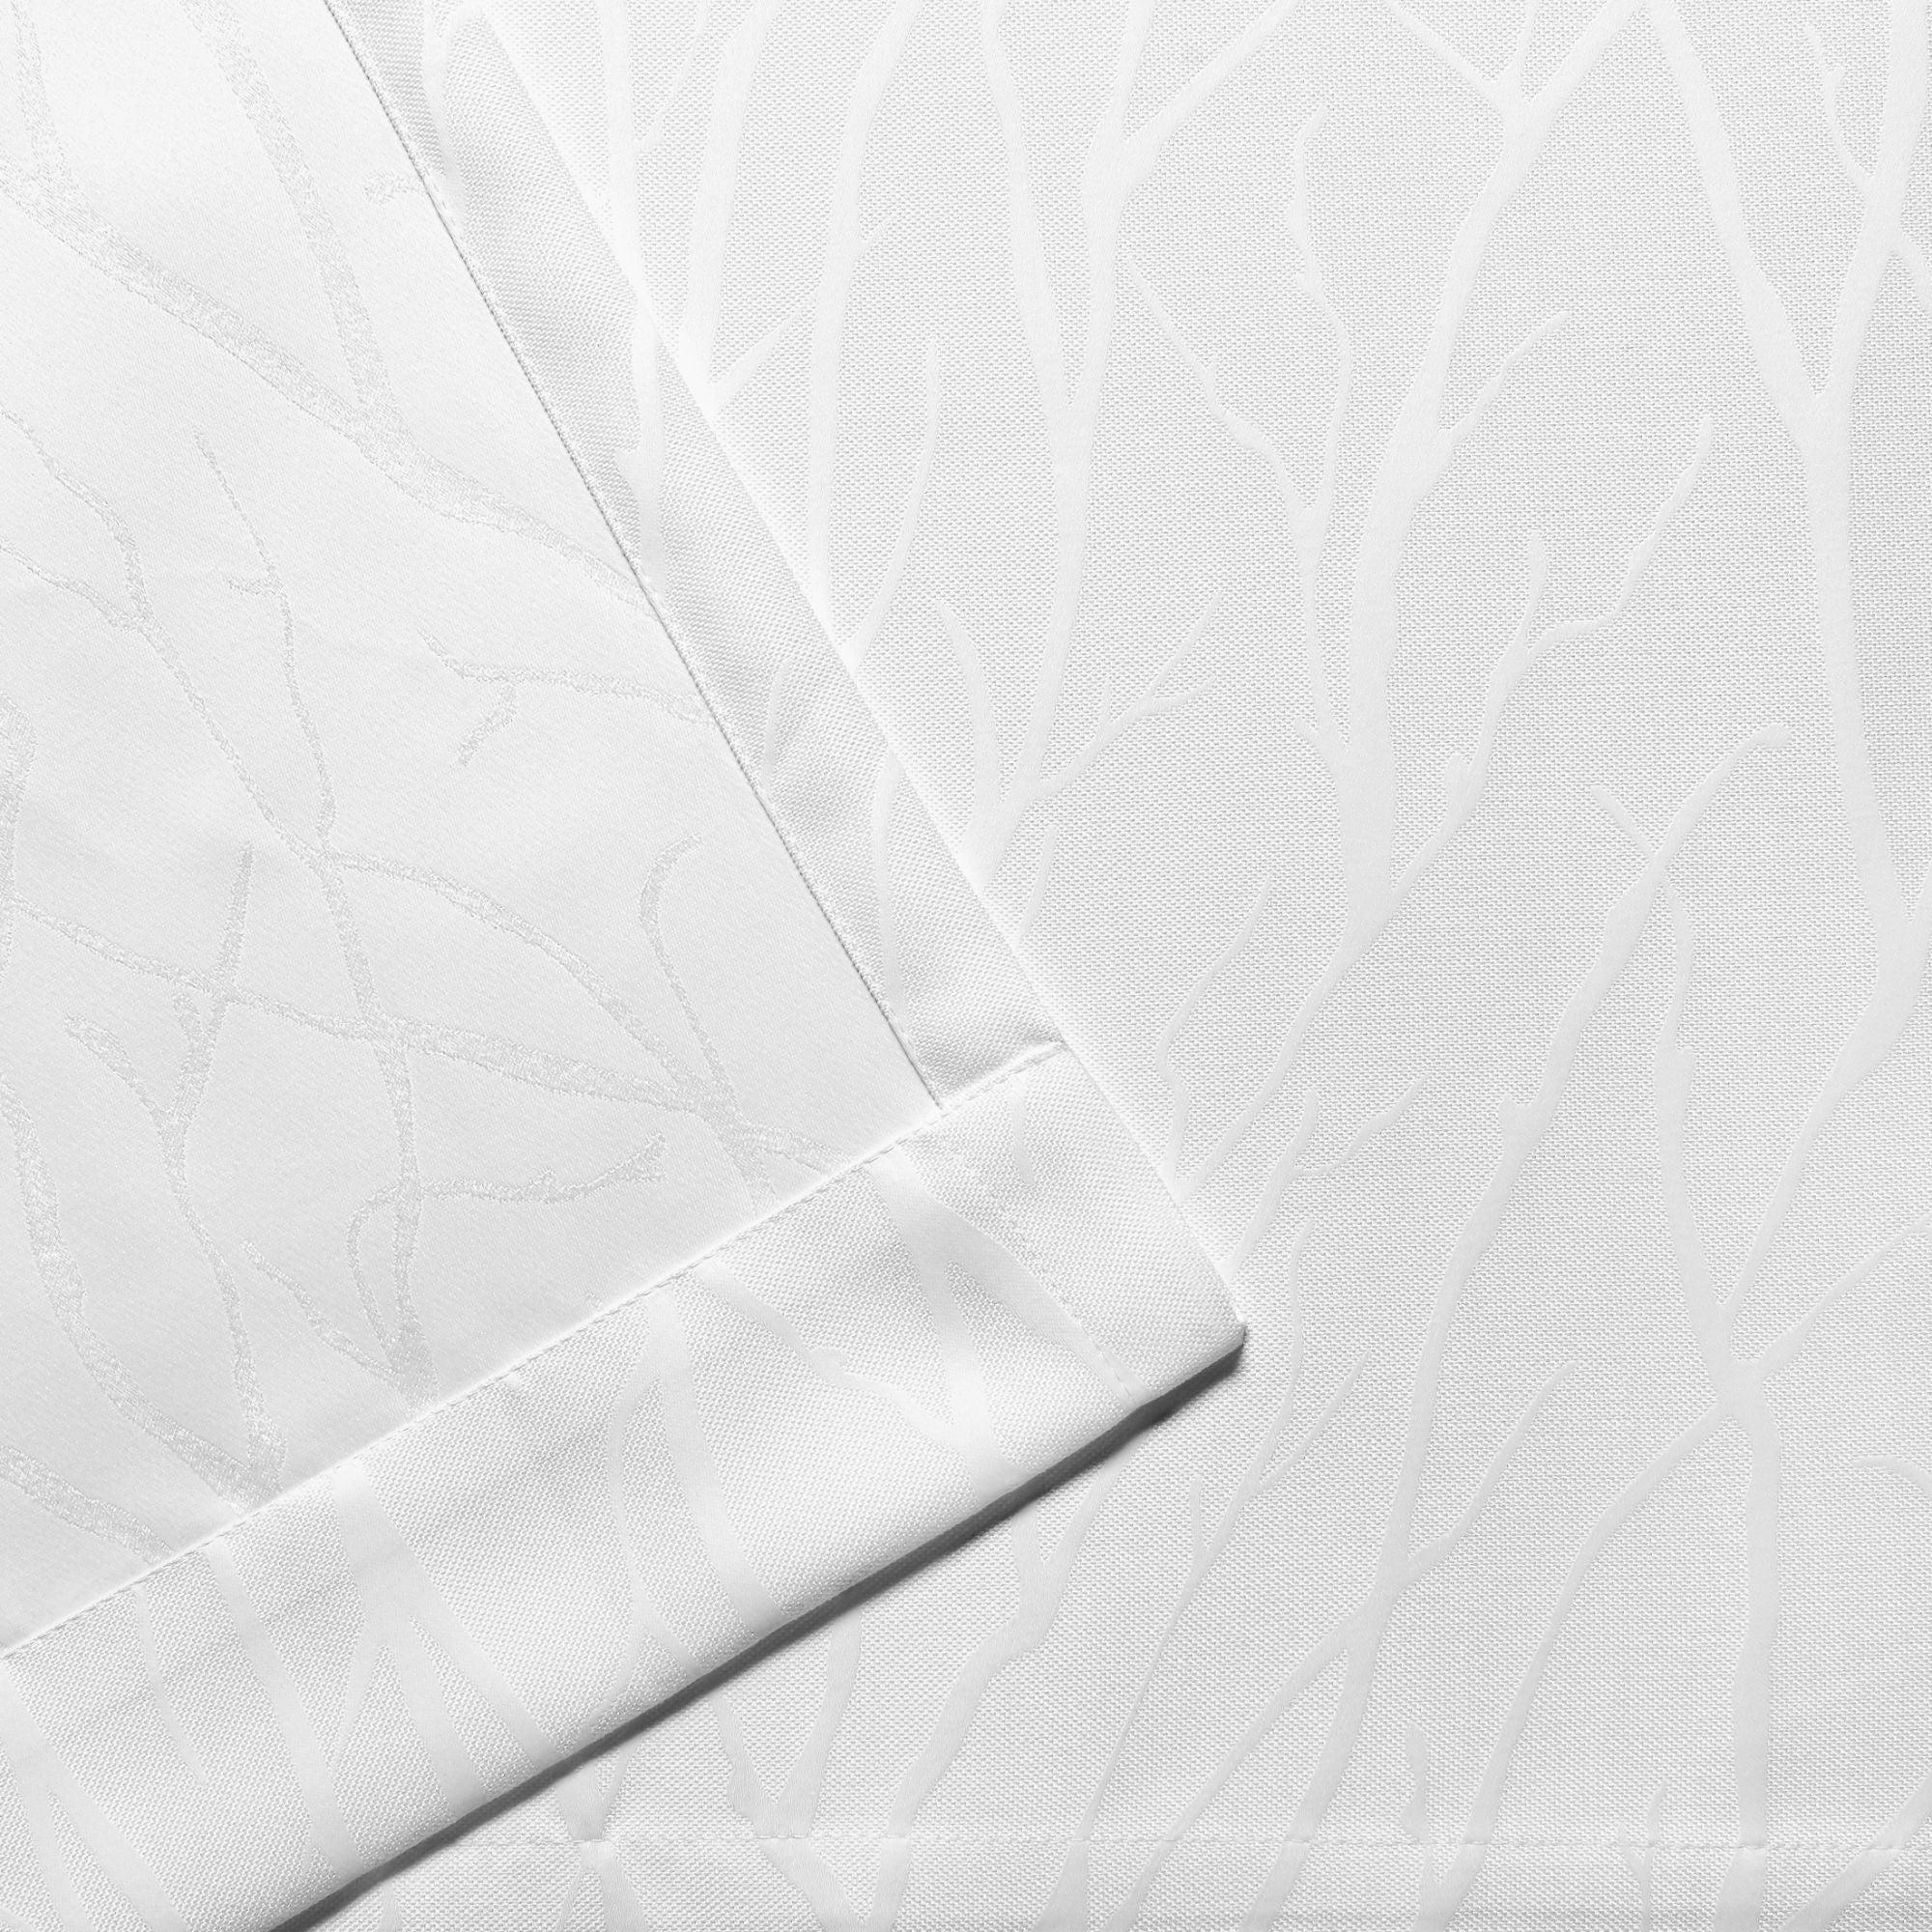 Davis Patio Grommet Top Single Curtain Panels Within Favorite Porch & Den Davis Patio Grommet Top 84 Inch X 108 Inch Single Curtain Panel (View 8 of 20)